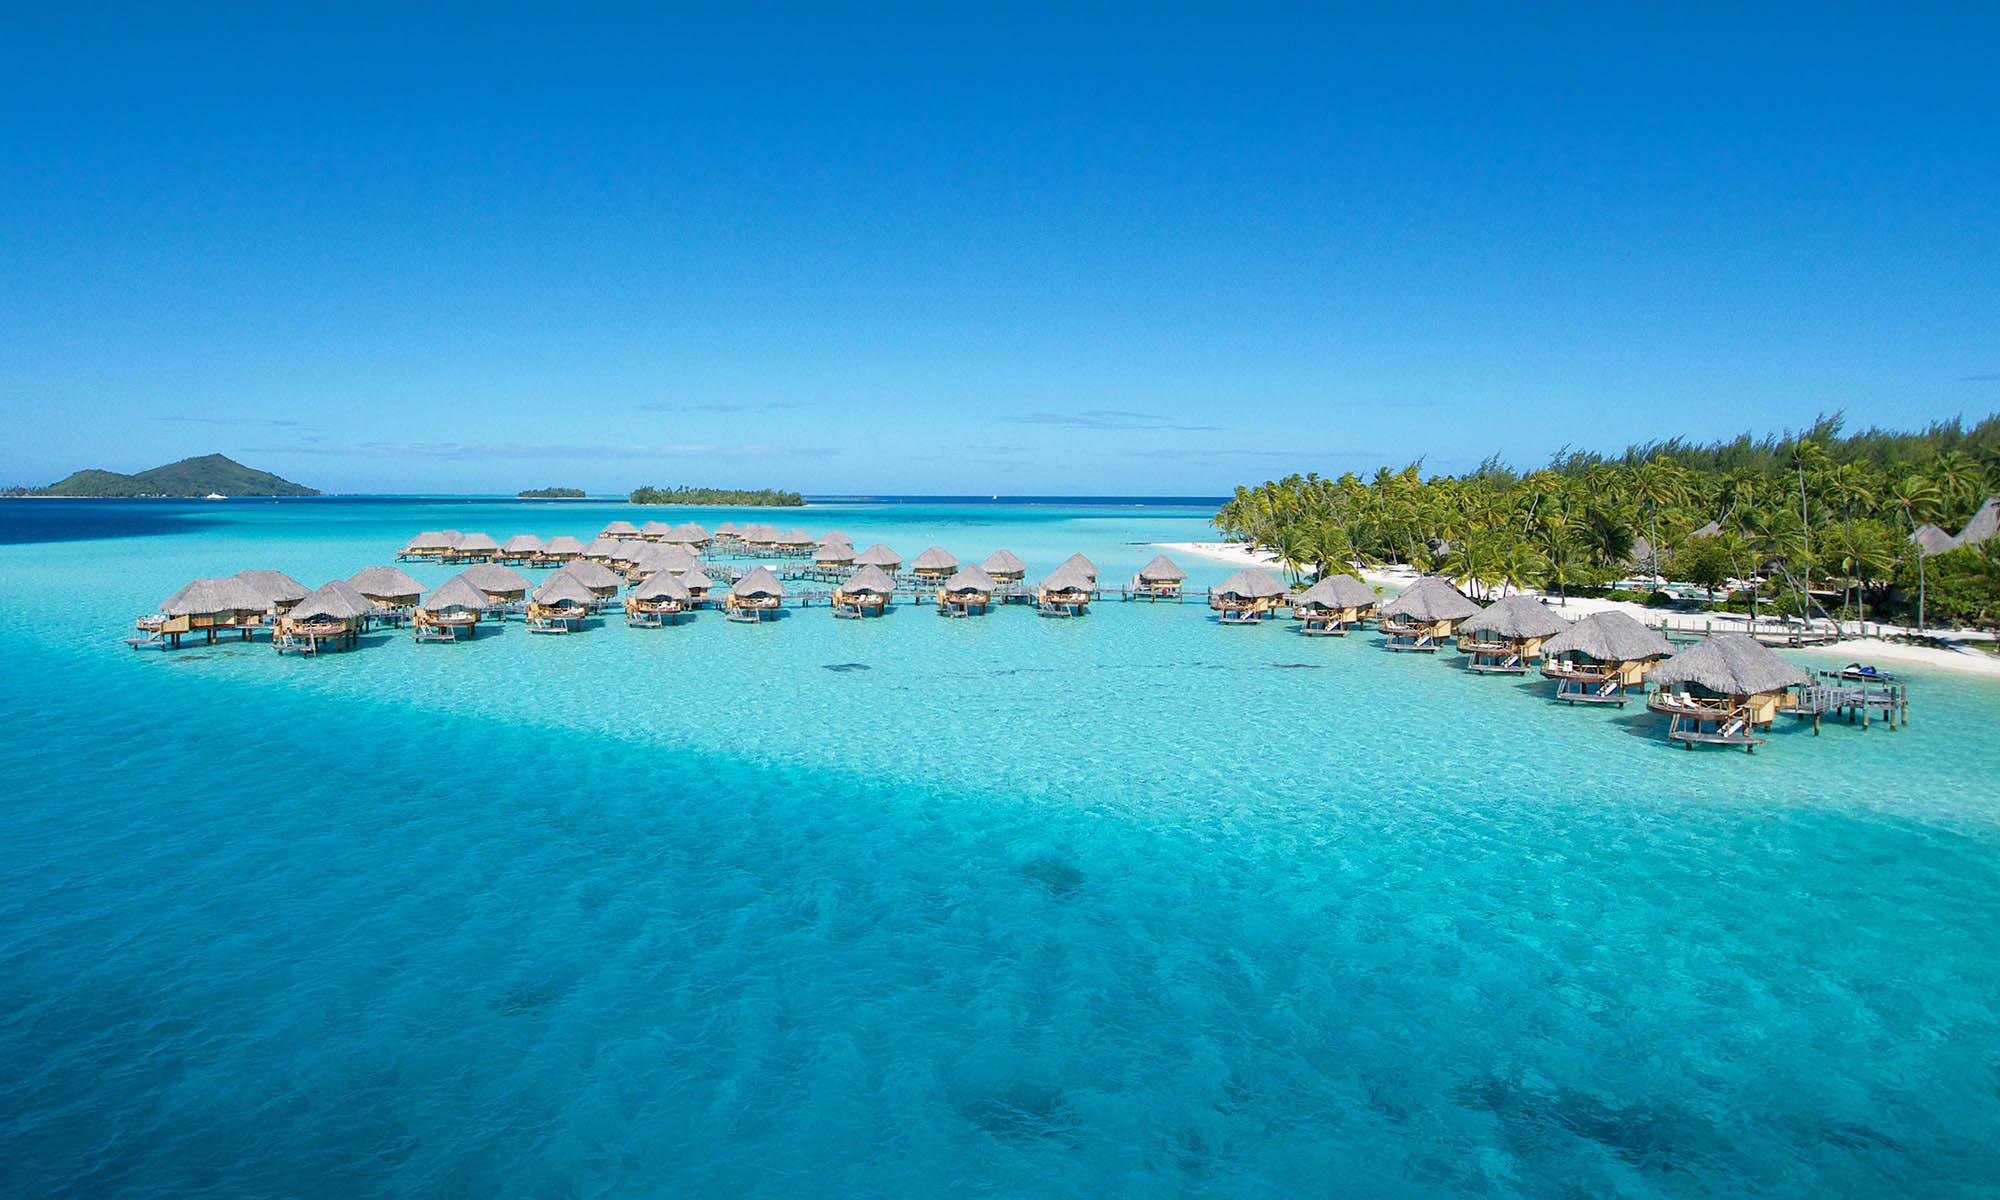 https://tahititourisme.com/wp-content/uploads/2020/12/Bora-Bora-Pearl-Beach-Resort-.jpg